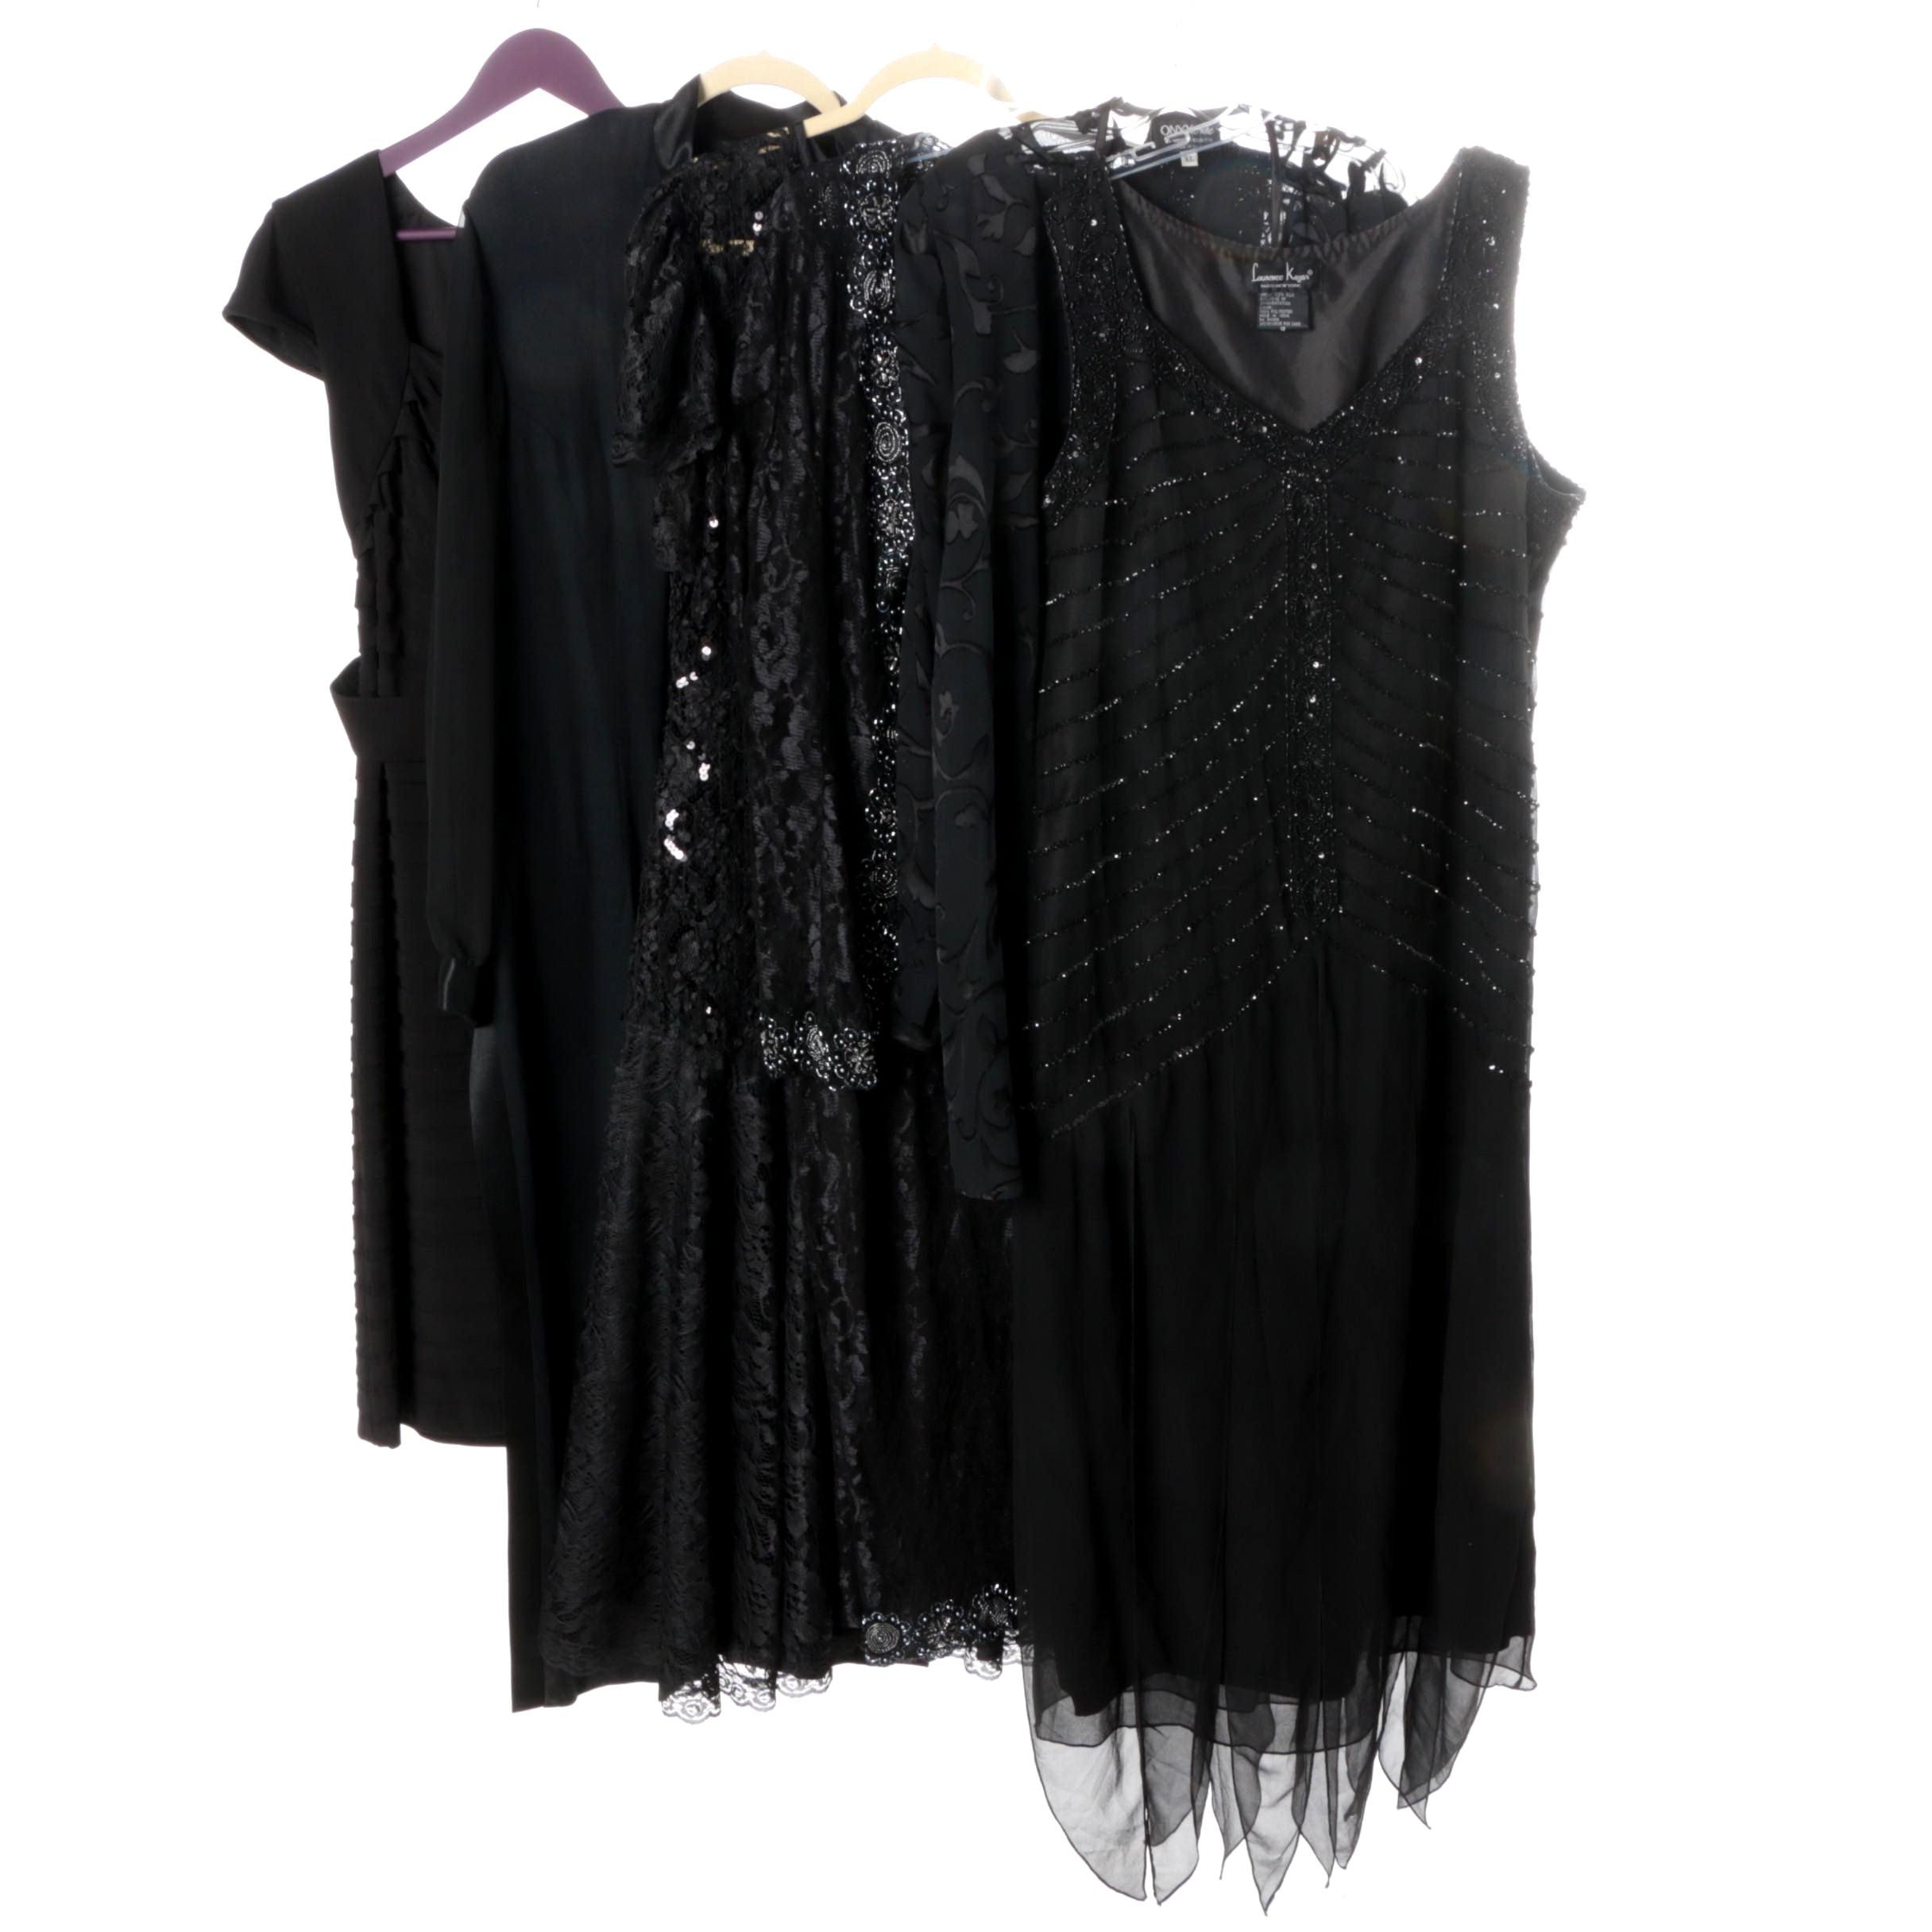 Black Evening Dresses Featuring Adriana Pappel